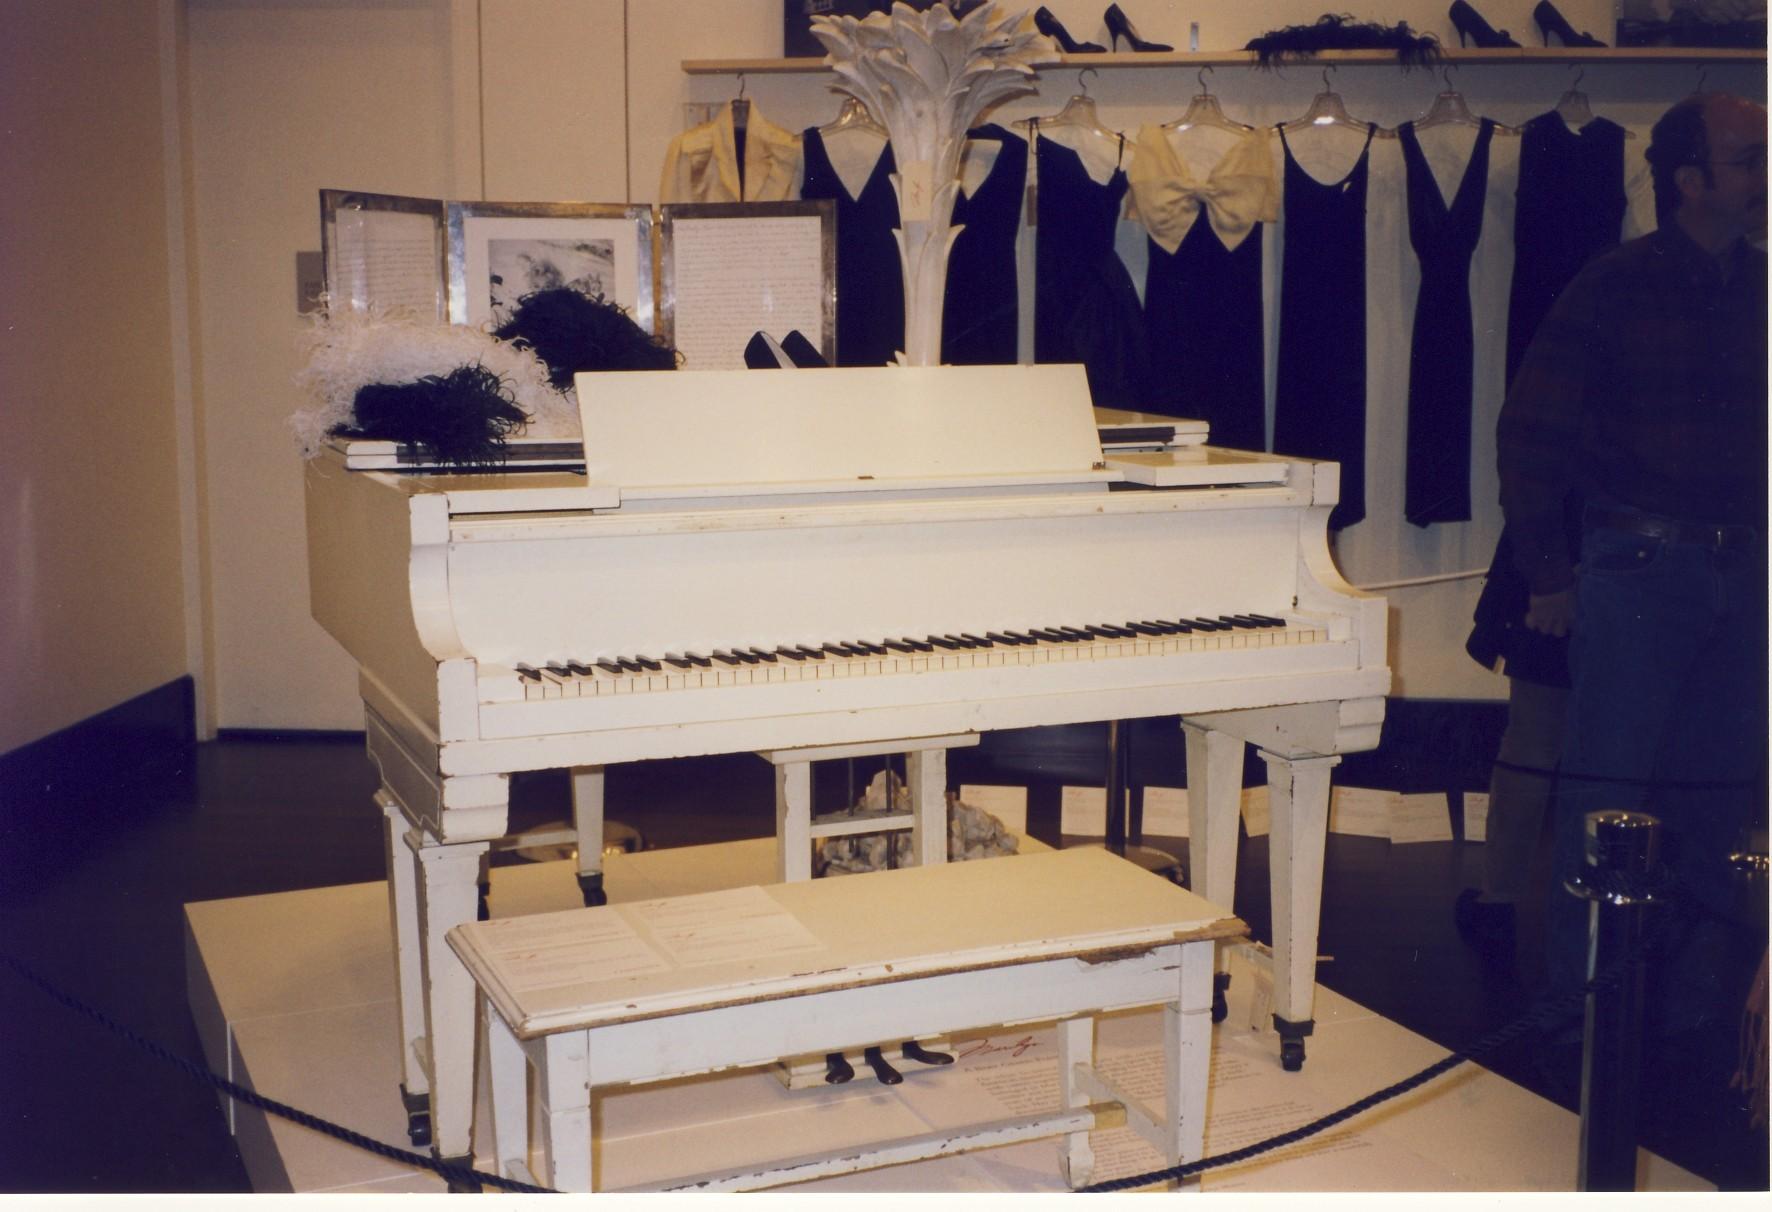 Marilyn-Monroe-Baby-Grand-Piyanosu